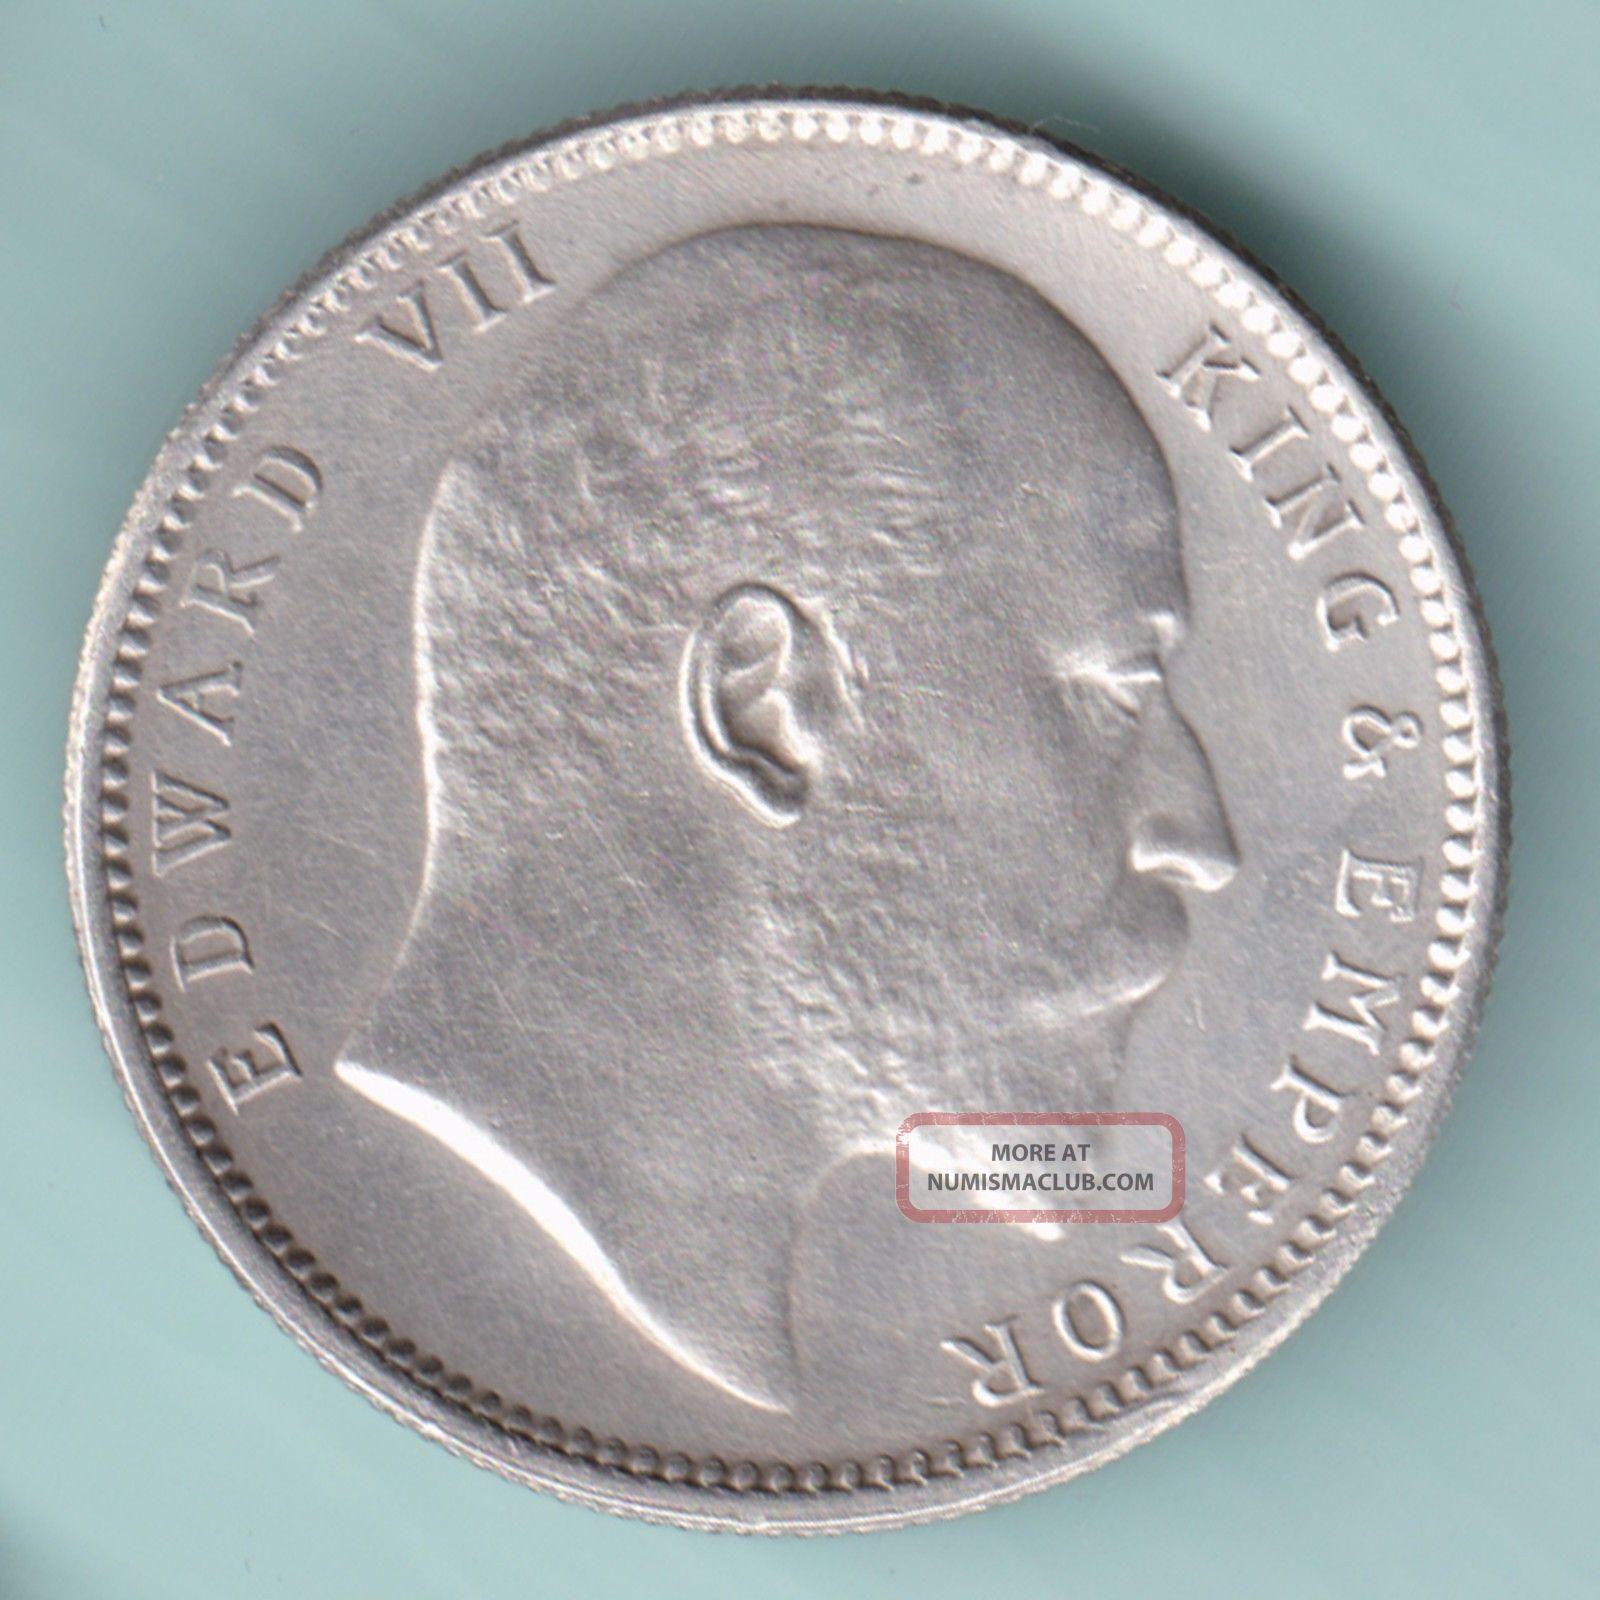 British India - 1910 - King Edward Vii - One Rupee - Rare Variety Silver Coin India photo